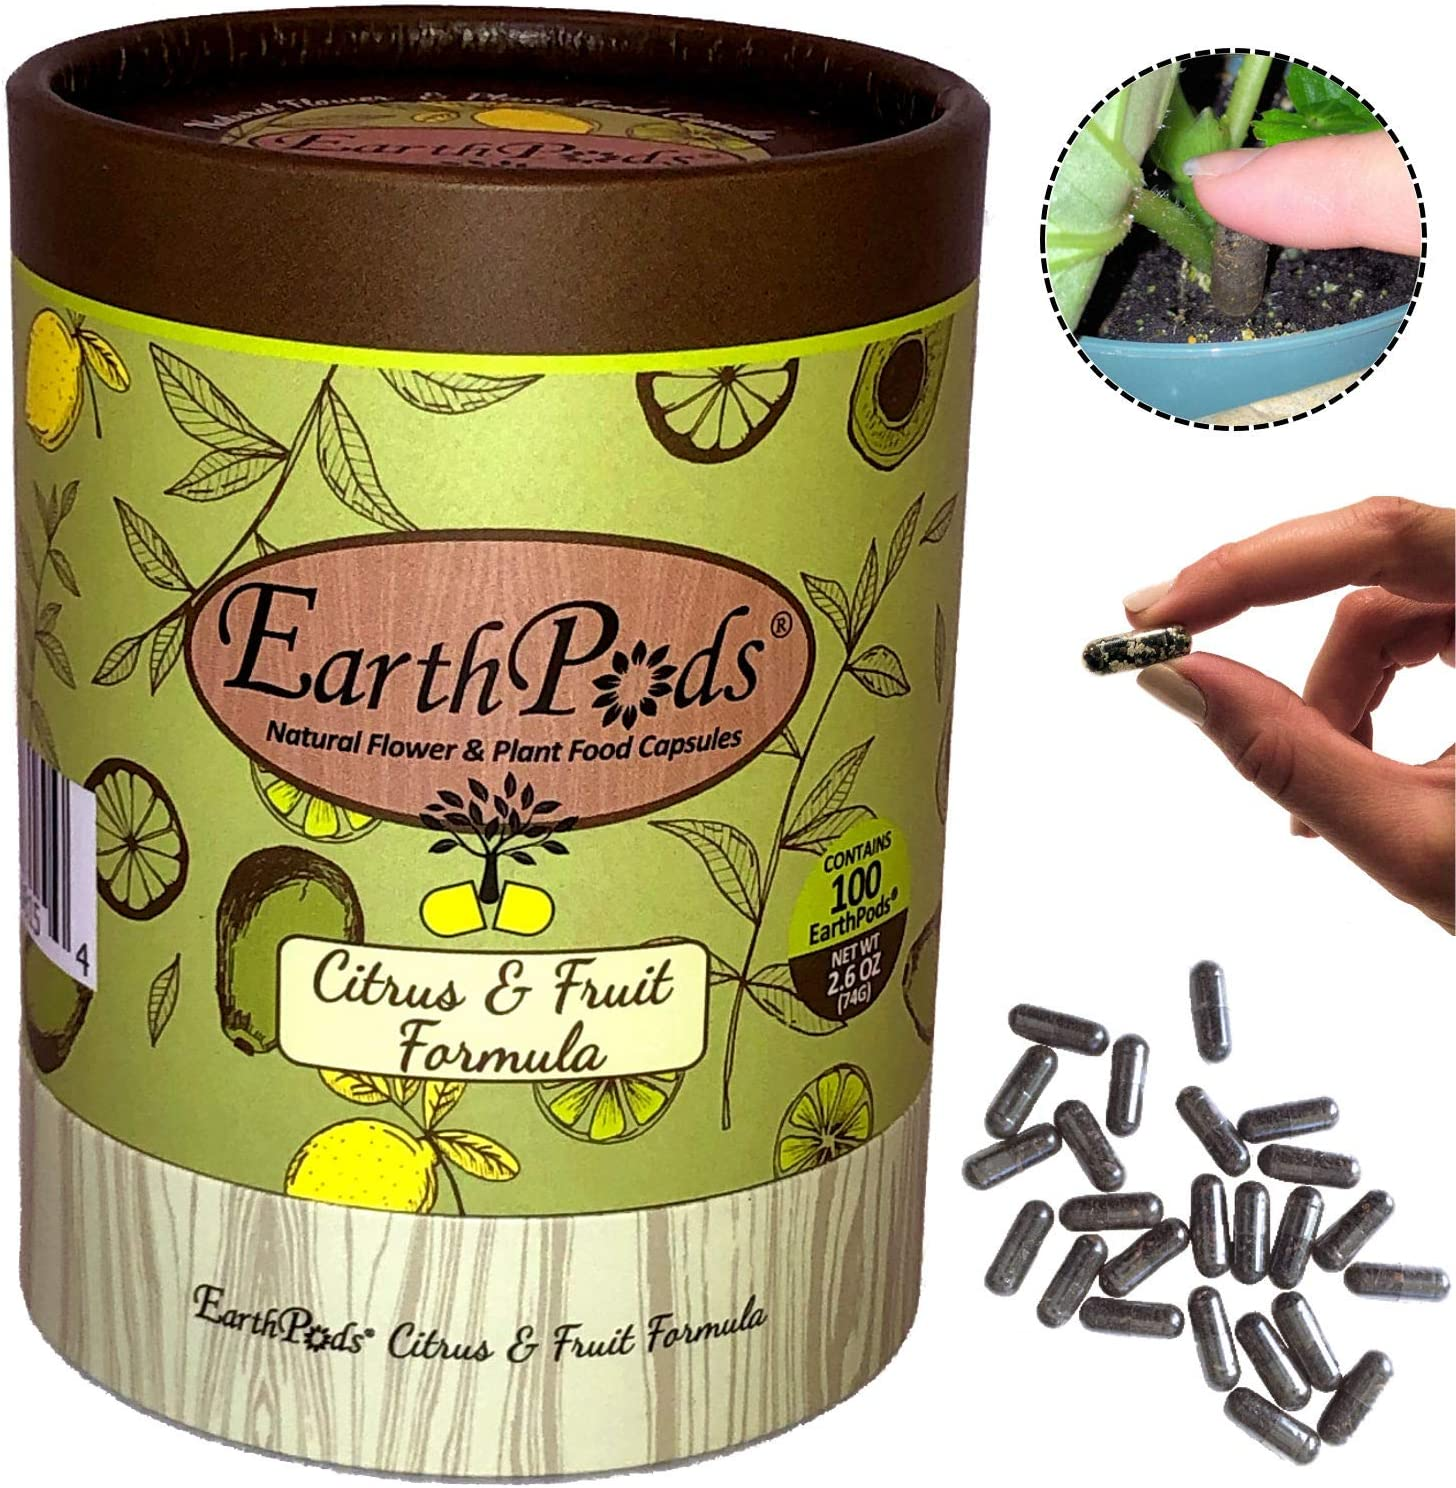 EarthPods Premium Fruit & Citrus Plant Food – Easy Organic Fertilizer Spikes – 100 Capsules – Boost Bloom, Fruit Flavor, Root Growth (Great for Dwarf Meyer Lemon, Lime, Orange, Avocado, Banana Trees)